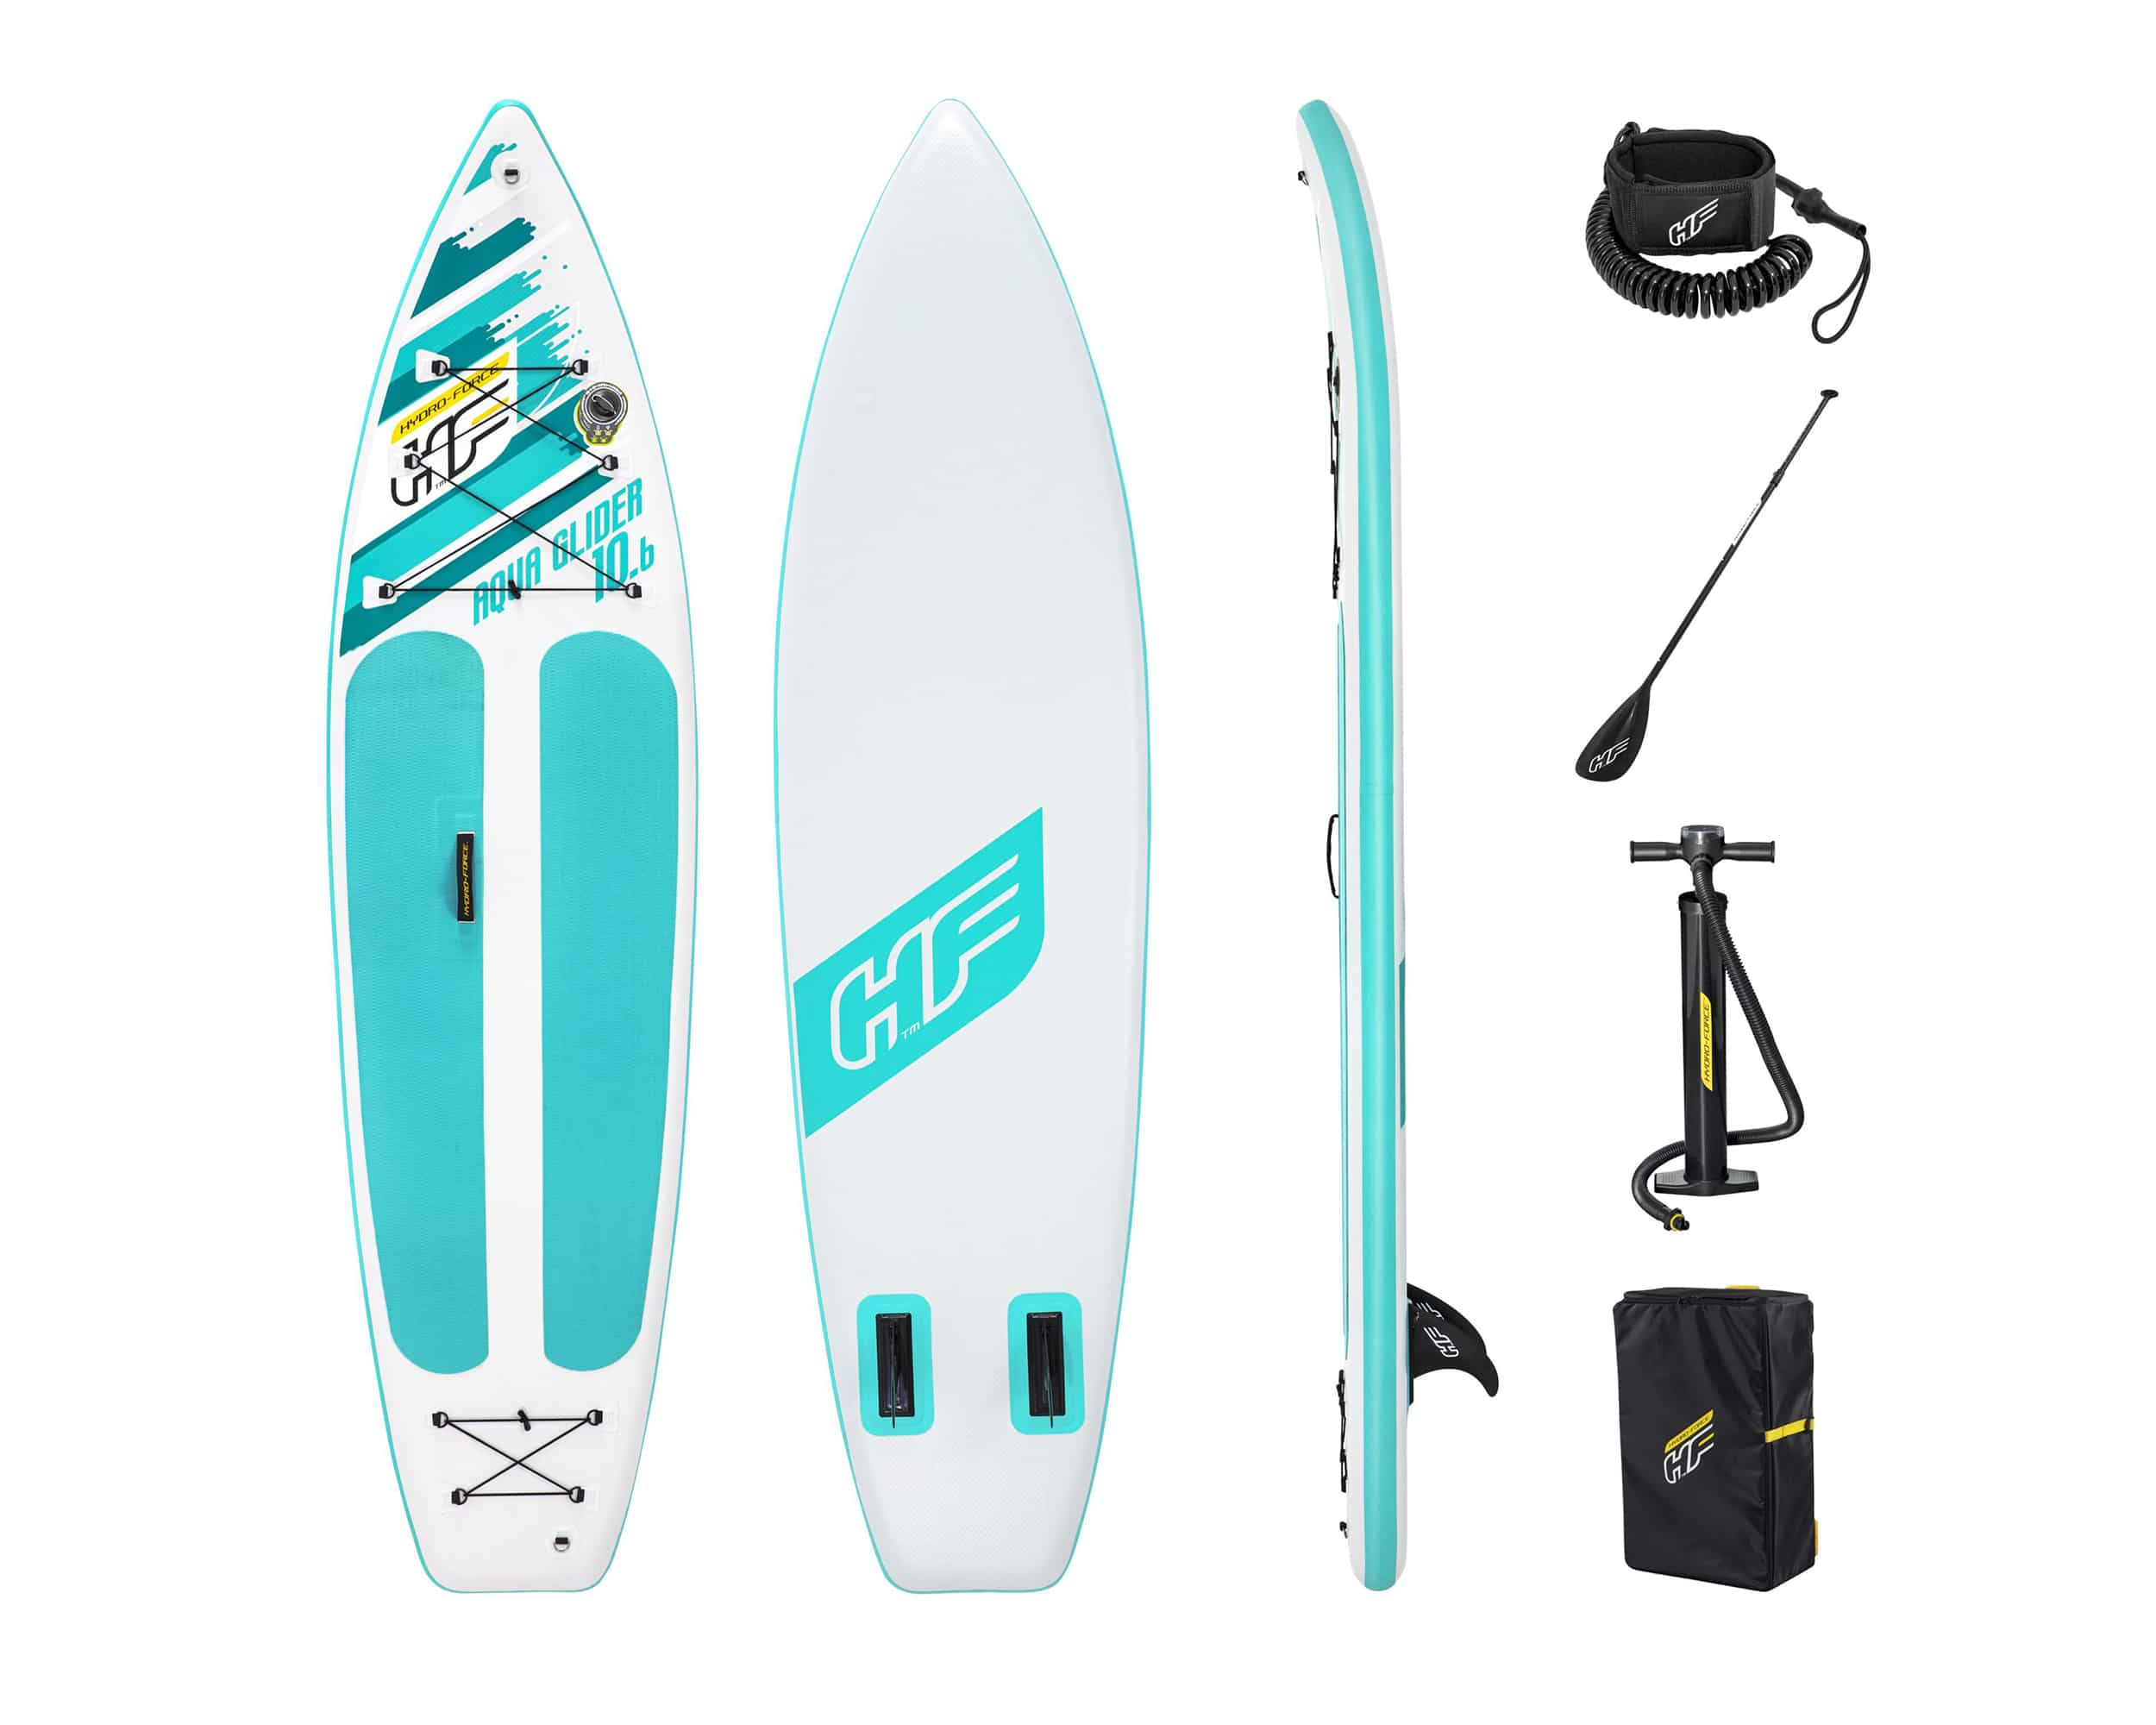 Hydro-Force Aqua Glider Sup Brett Paddleboard